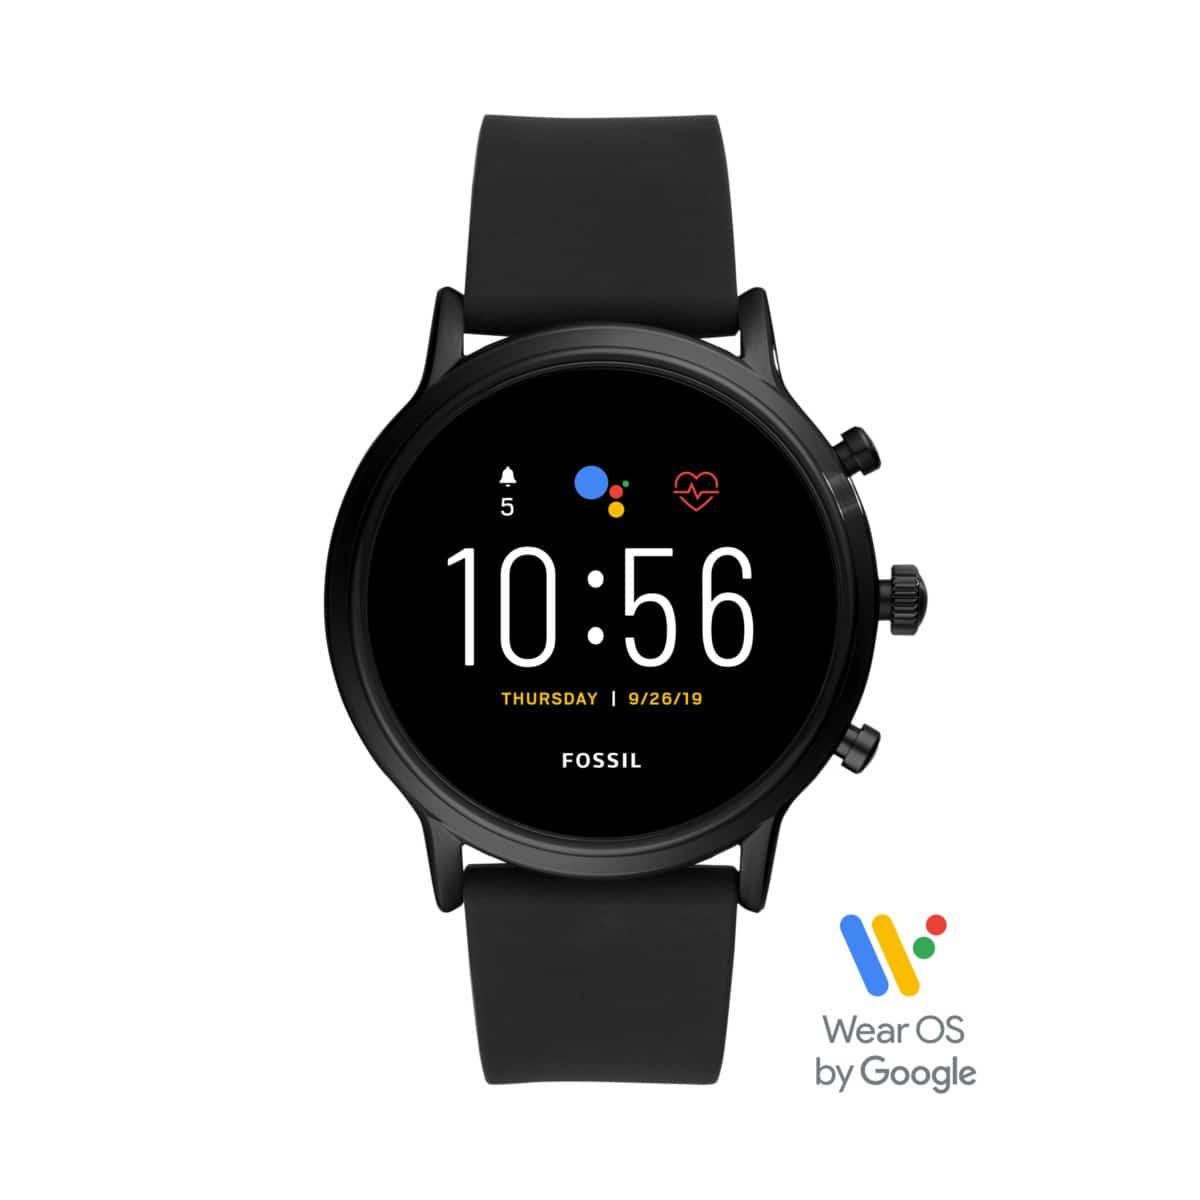 Fossil Gen 5 Smartwatch 5